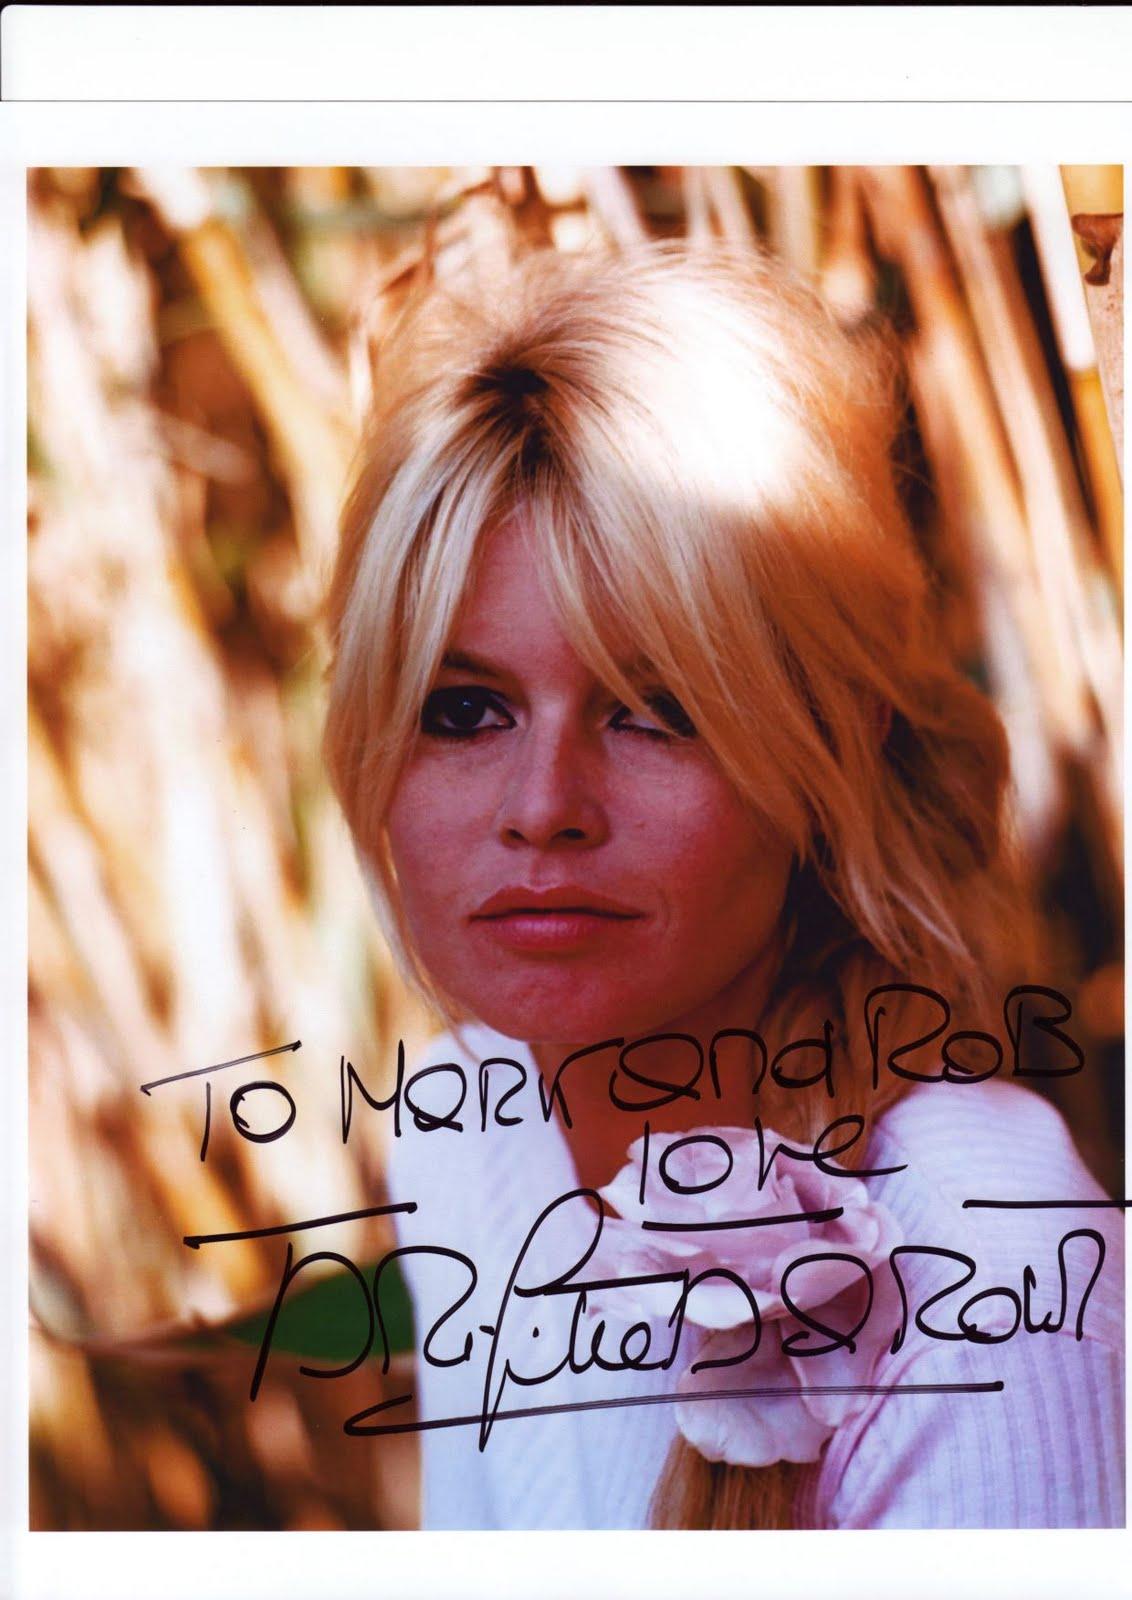 http://2.bp.blogspot.com/-Nr9F0f3OdTg/TfEFKB0CMfI/AAAAAAAAADE/AG-hpl1jtsU/s1600/Brigitte_Bardot-r573464.jpg